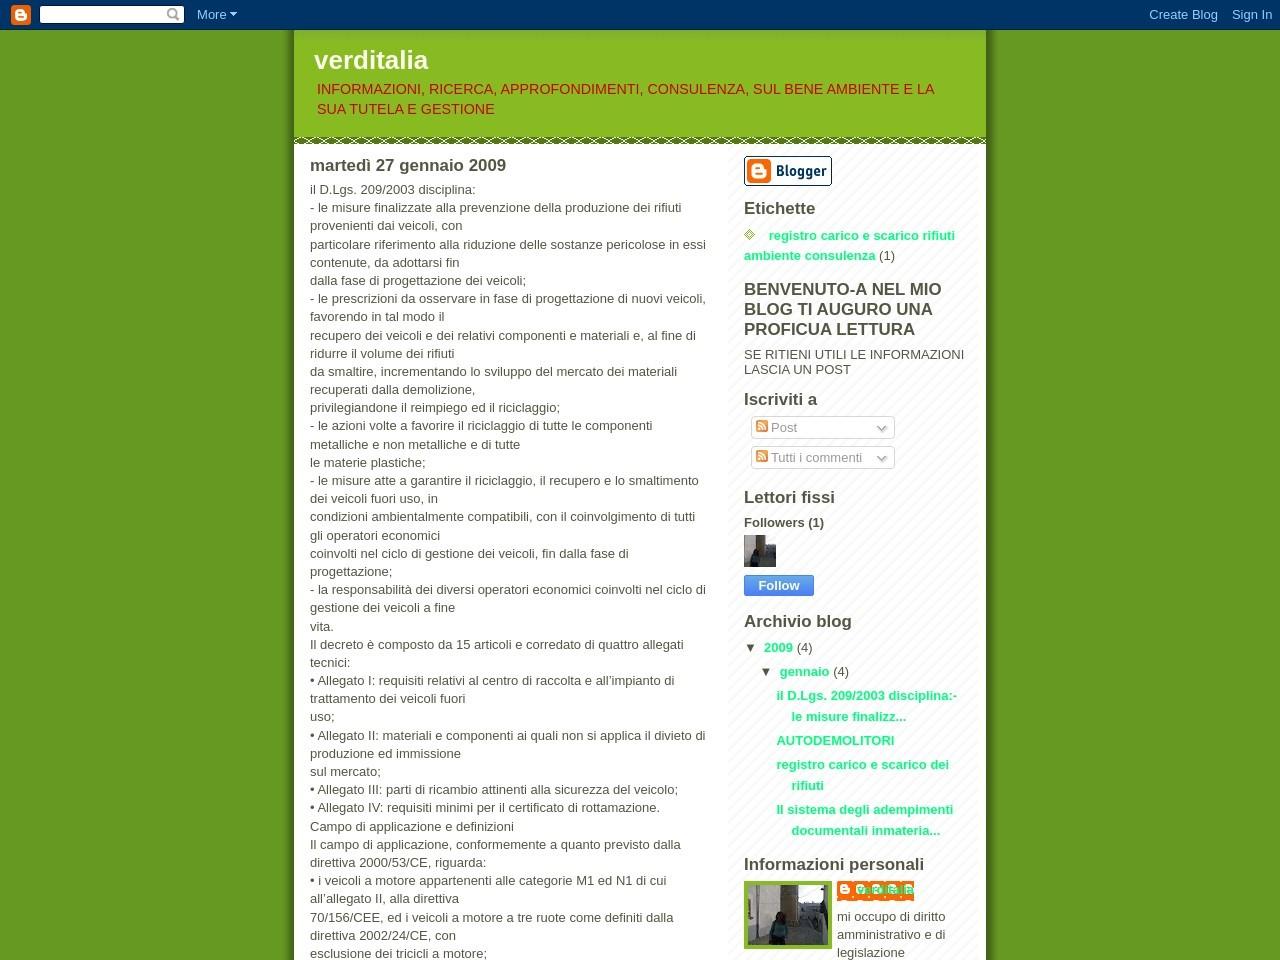 verditalia-blogspot-com